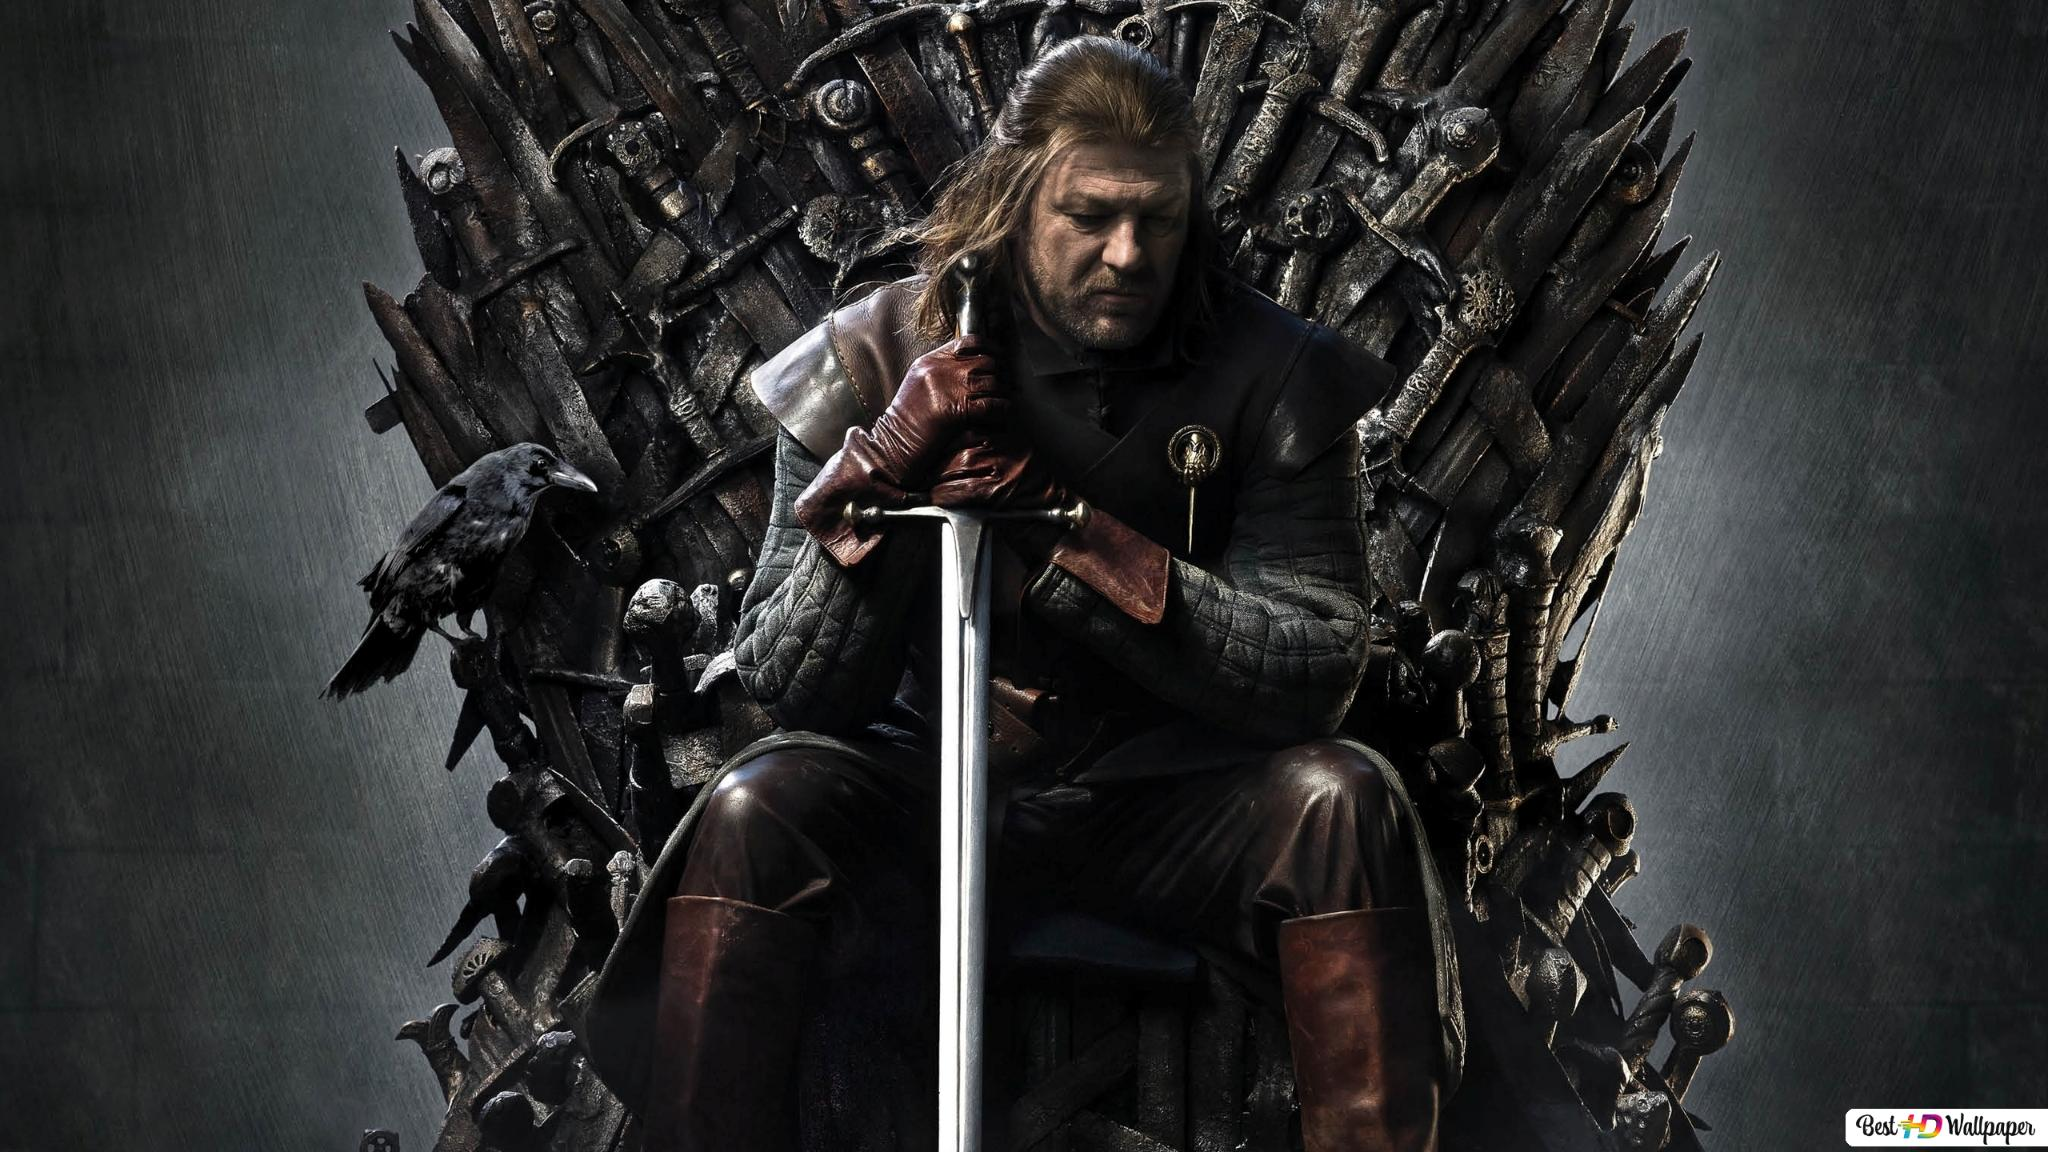 Eddard Stark On The Iron Throne Hd Wallpaper Download